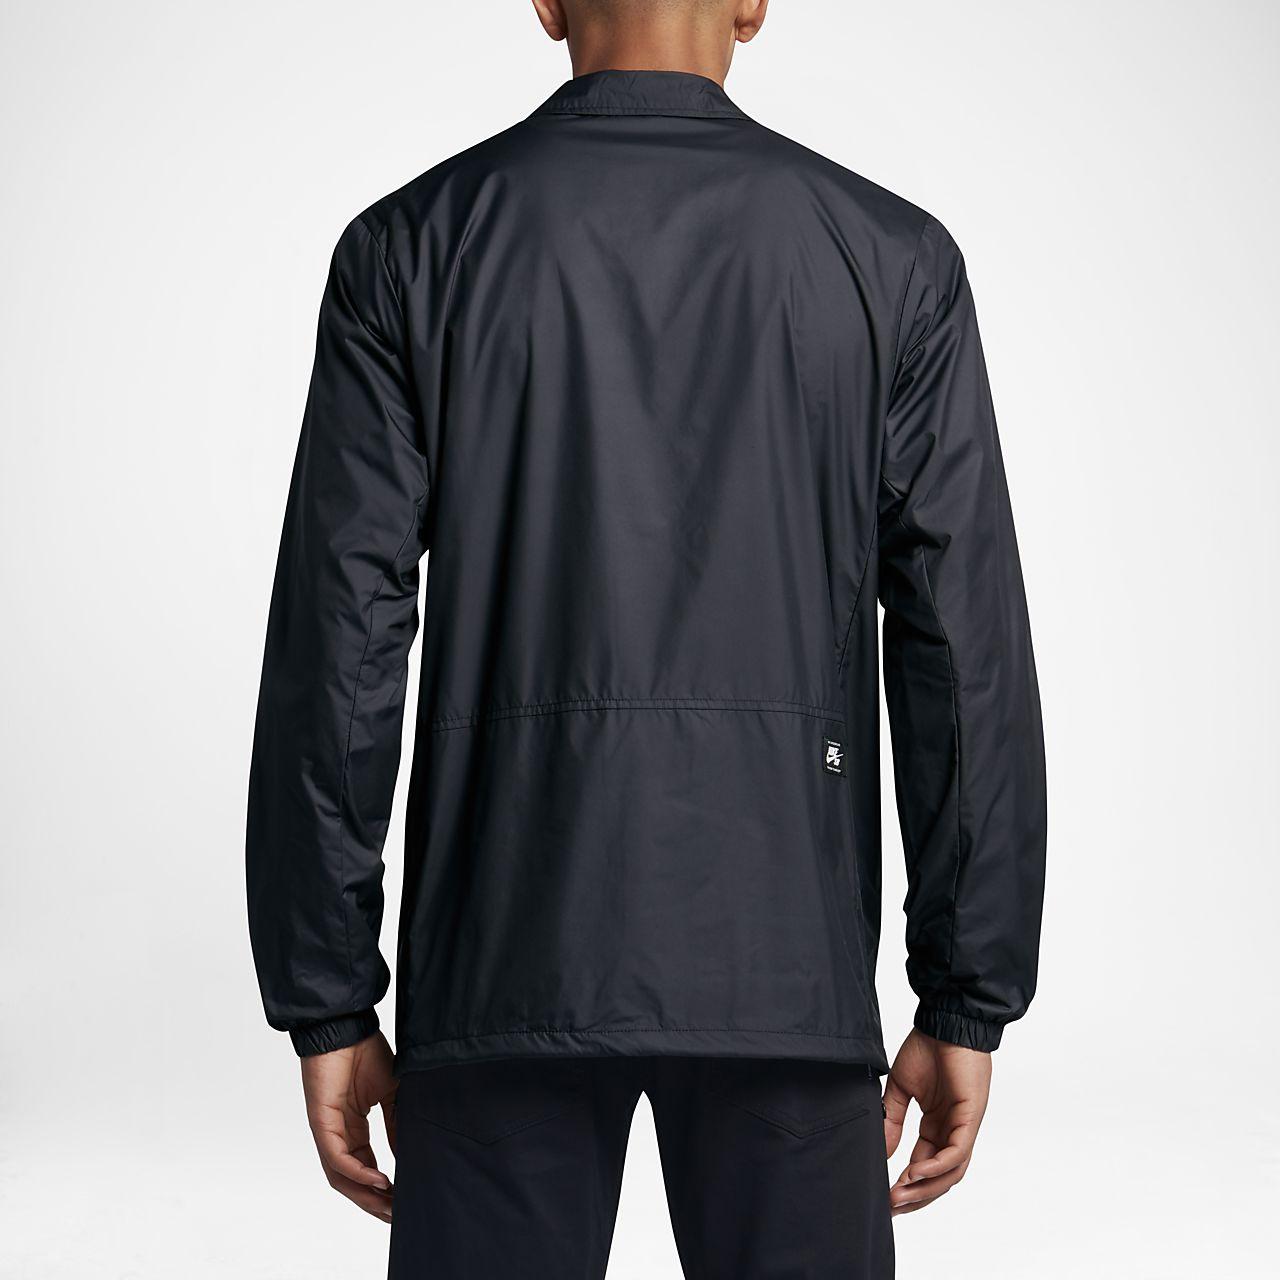 b31426d57f2b Nike SB Shield Coaches Men s Jacket. Nike.com AU